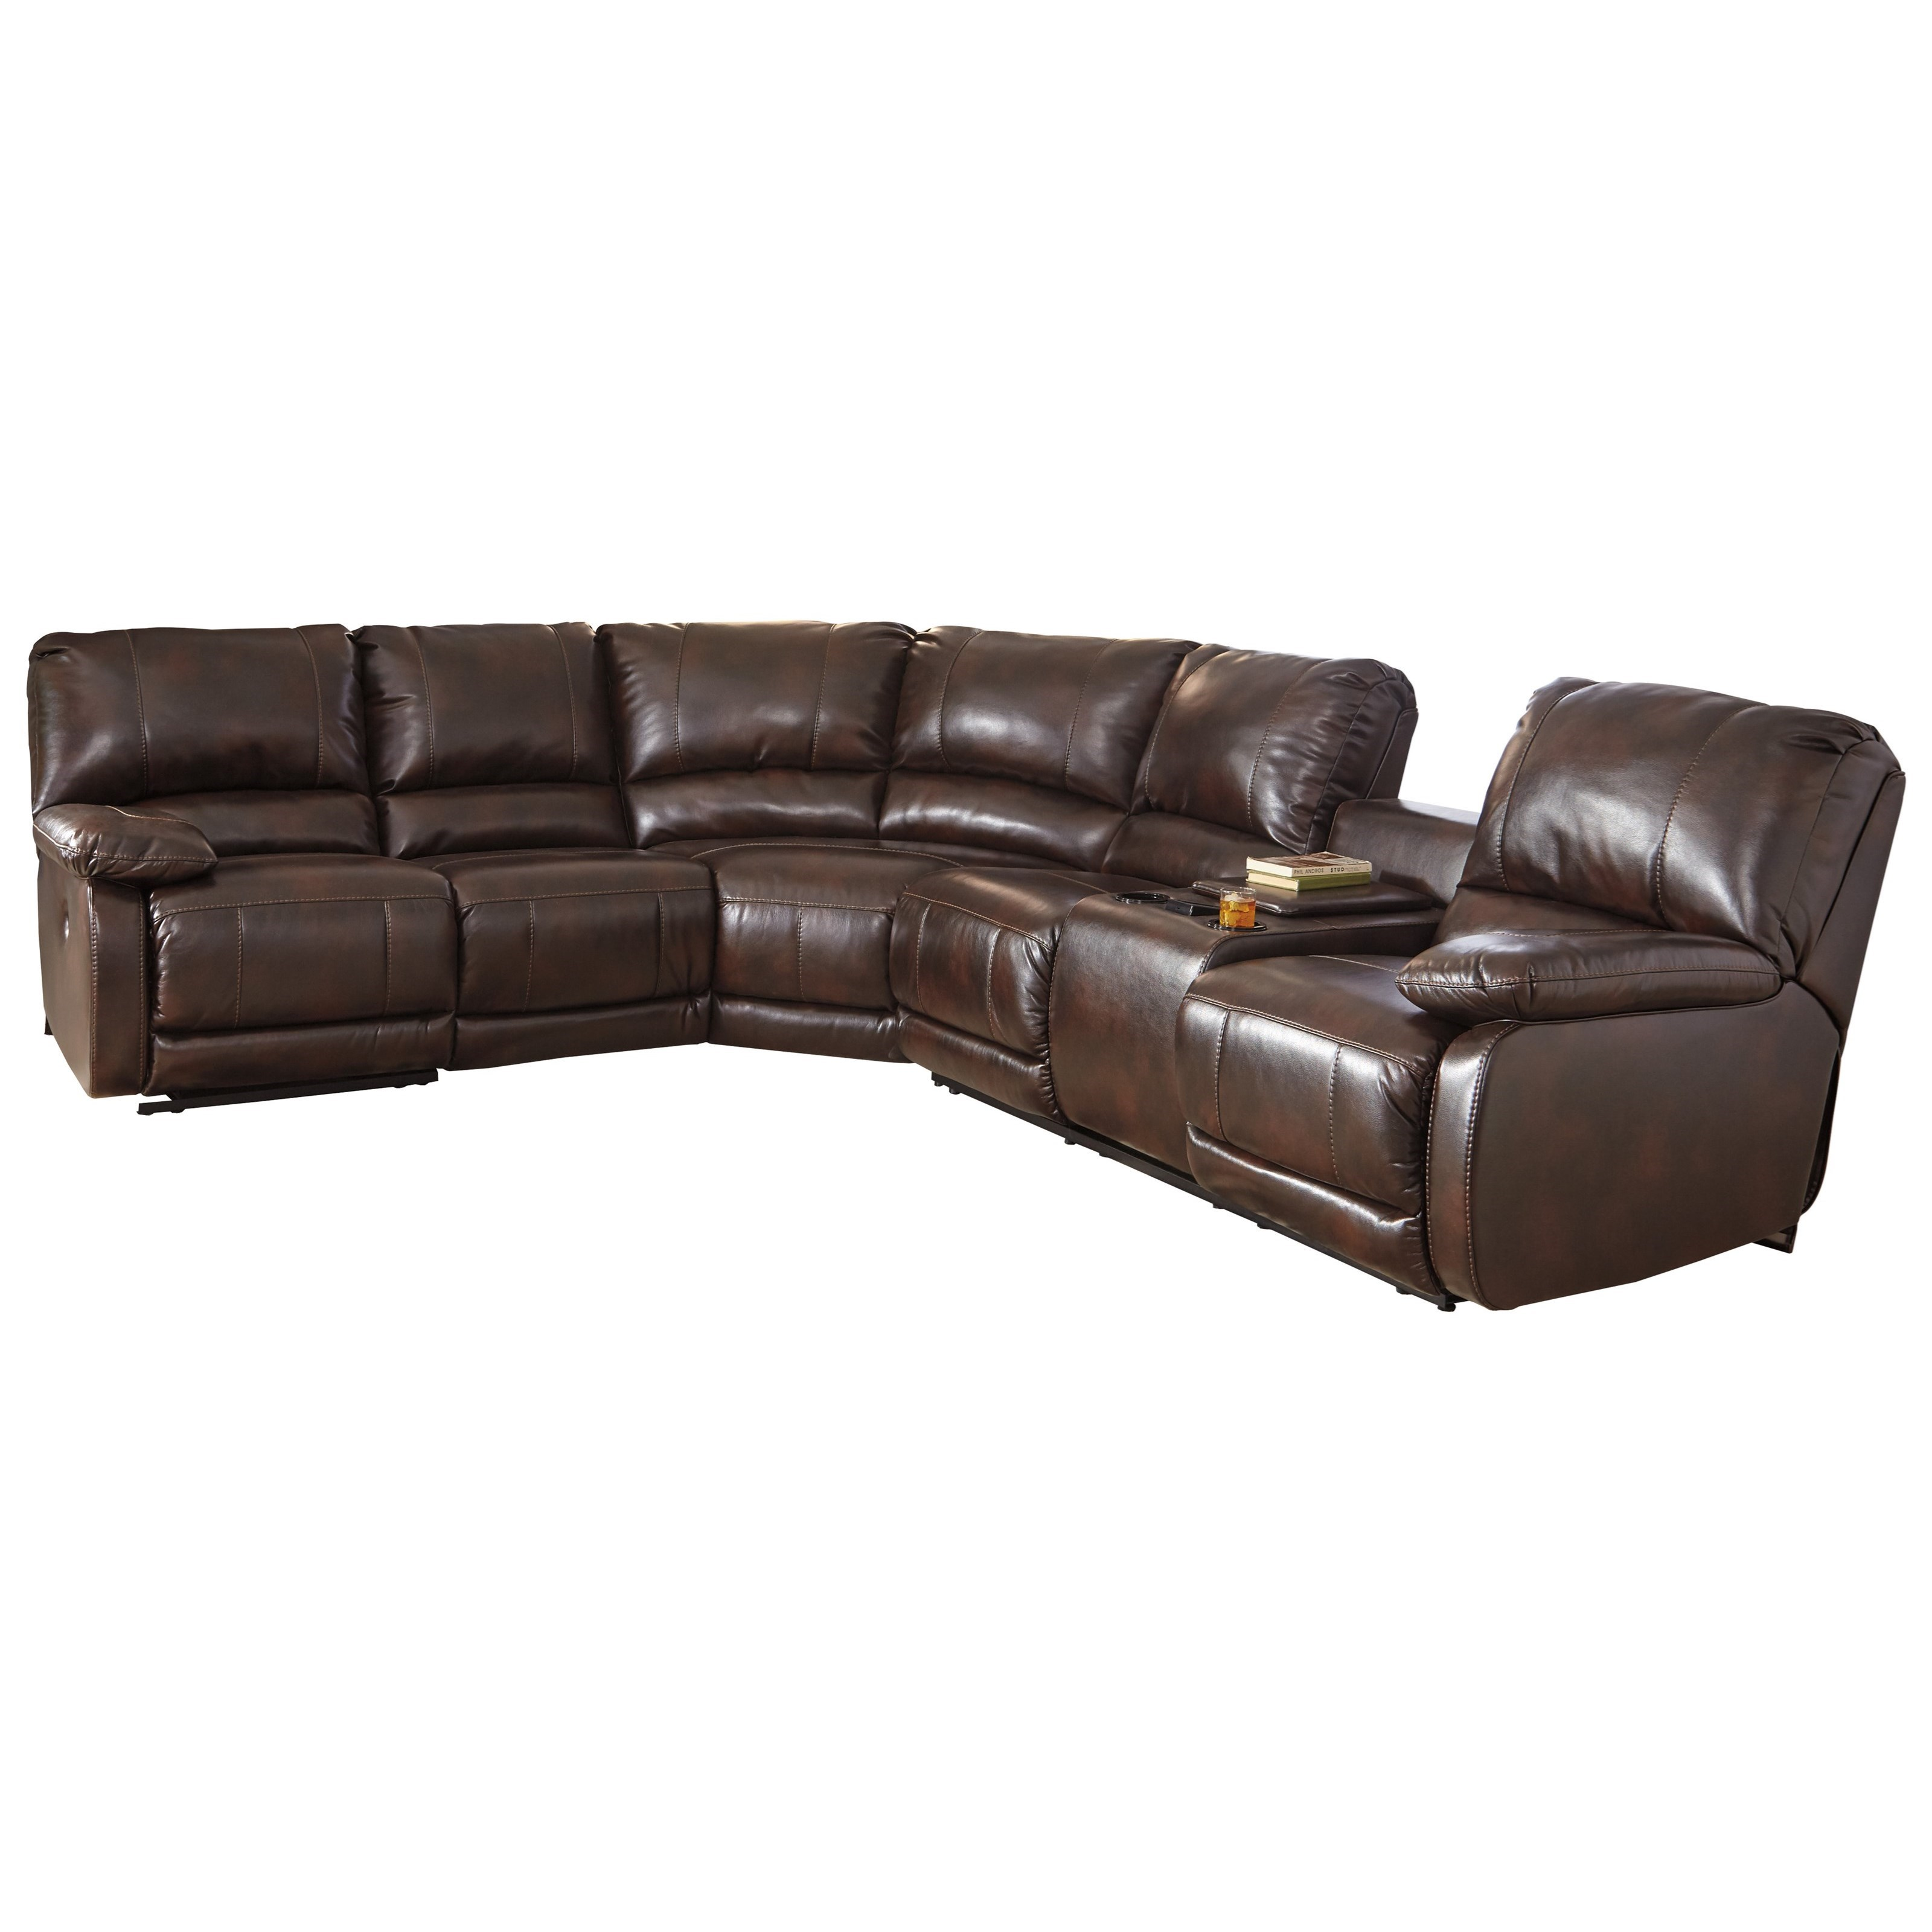 reclining massage sofa blue velvet images signature design by ashley hallettsville power